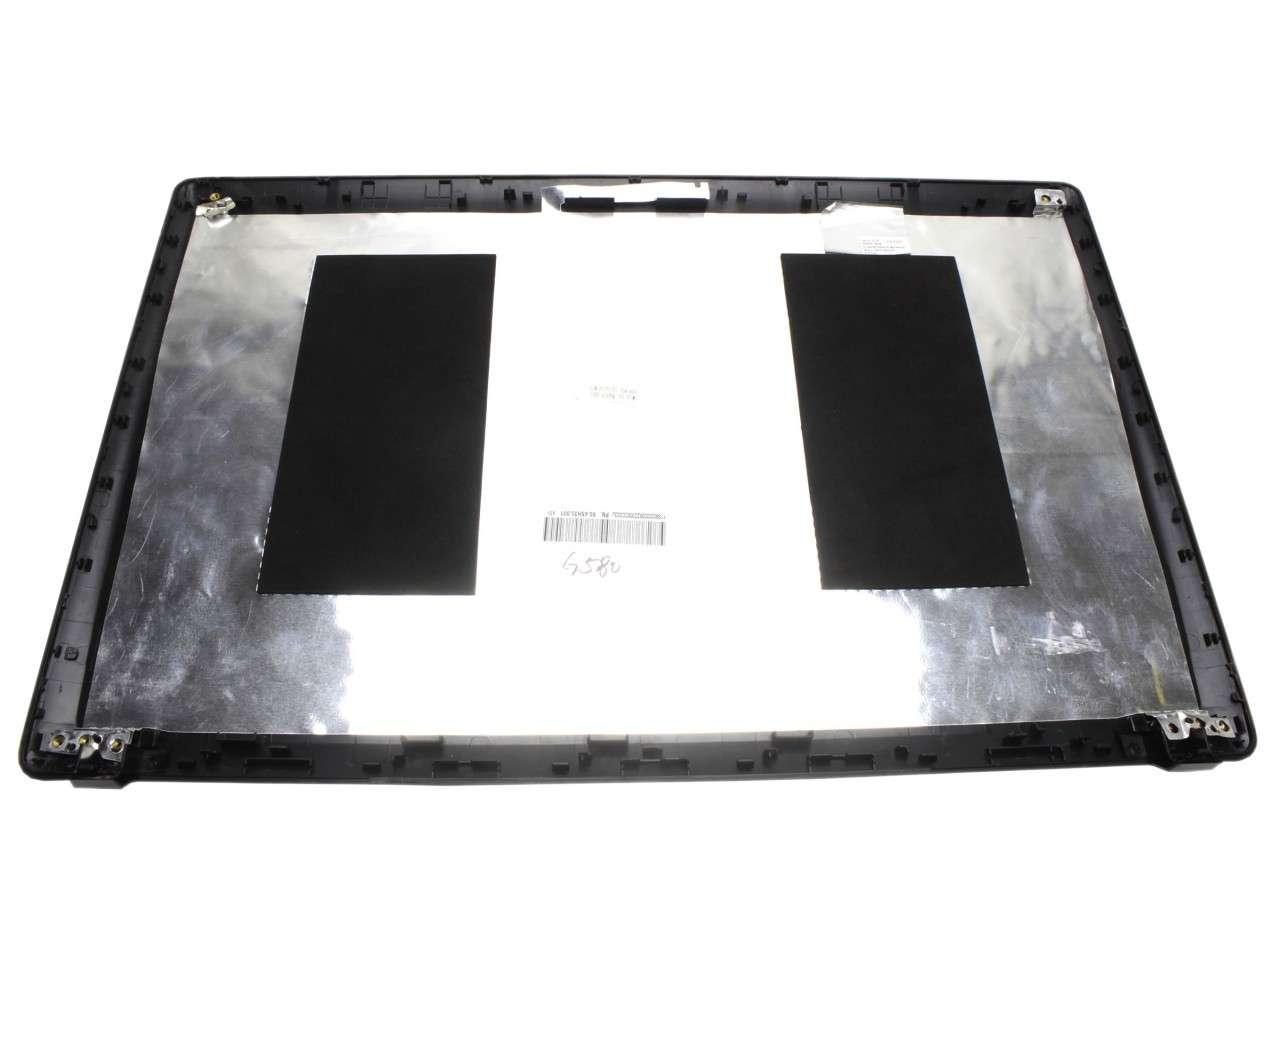 Capac Display BackCover Lenovo G580 Carcasa Display Neagra Varianta 1 imagine powerlaptop.ro 2021